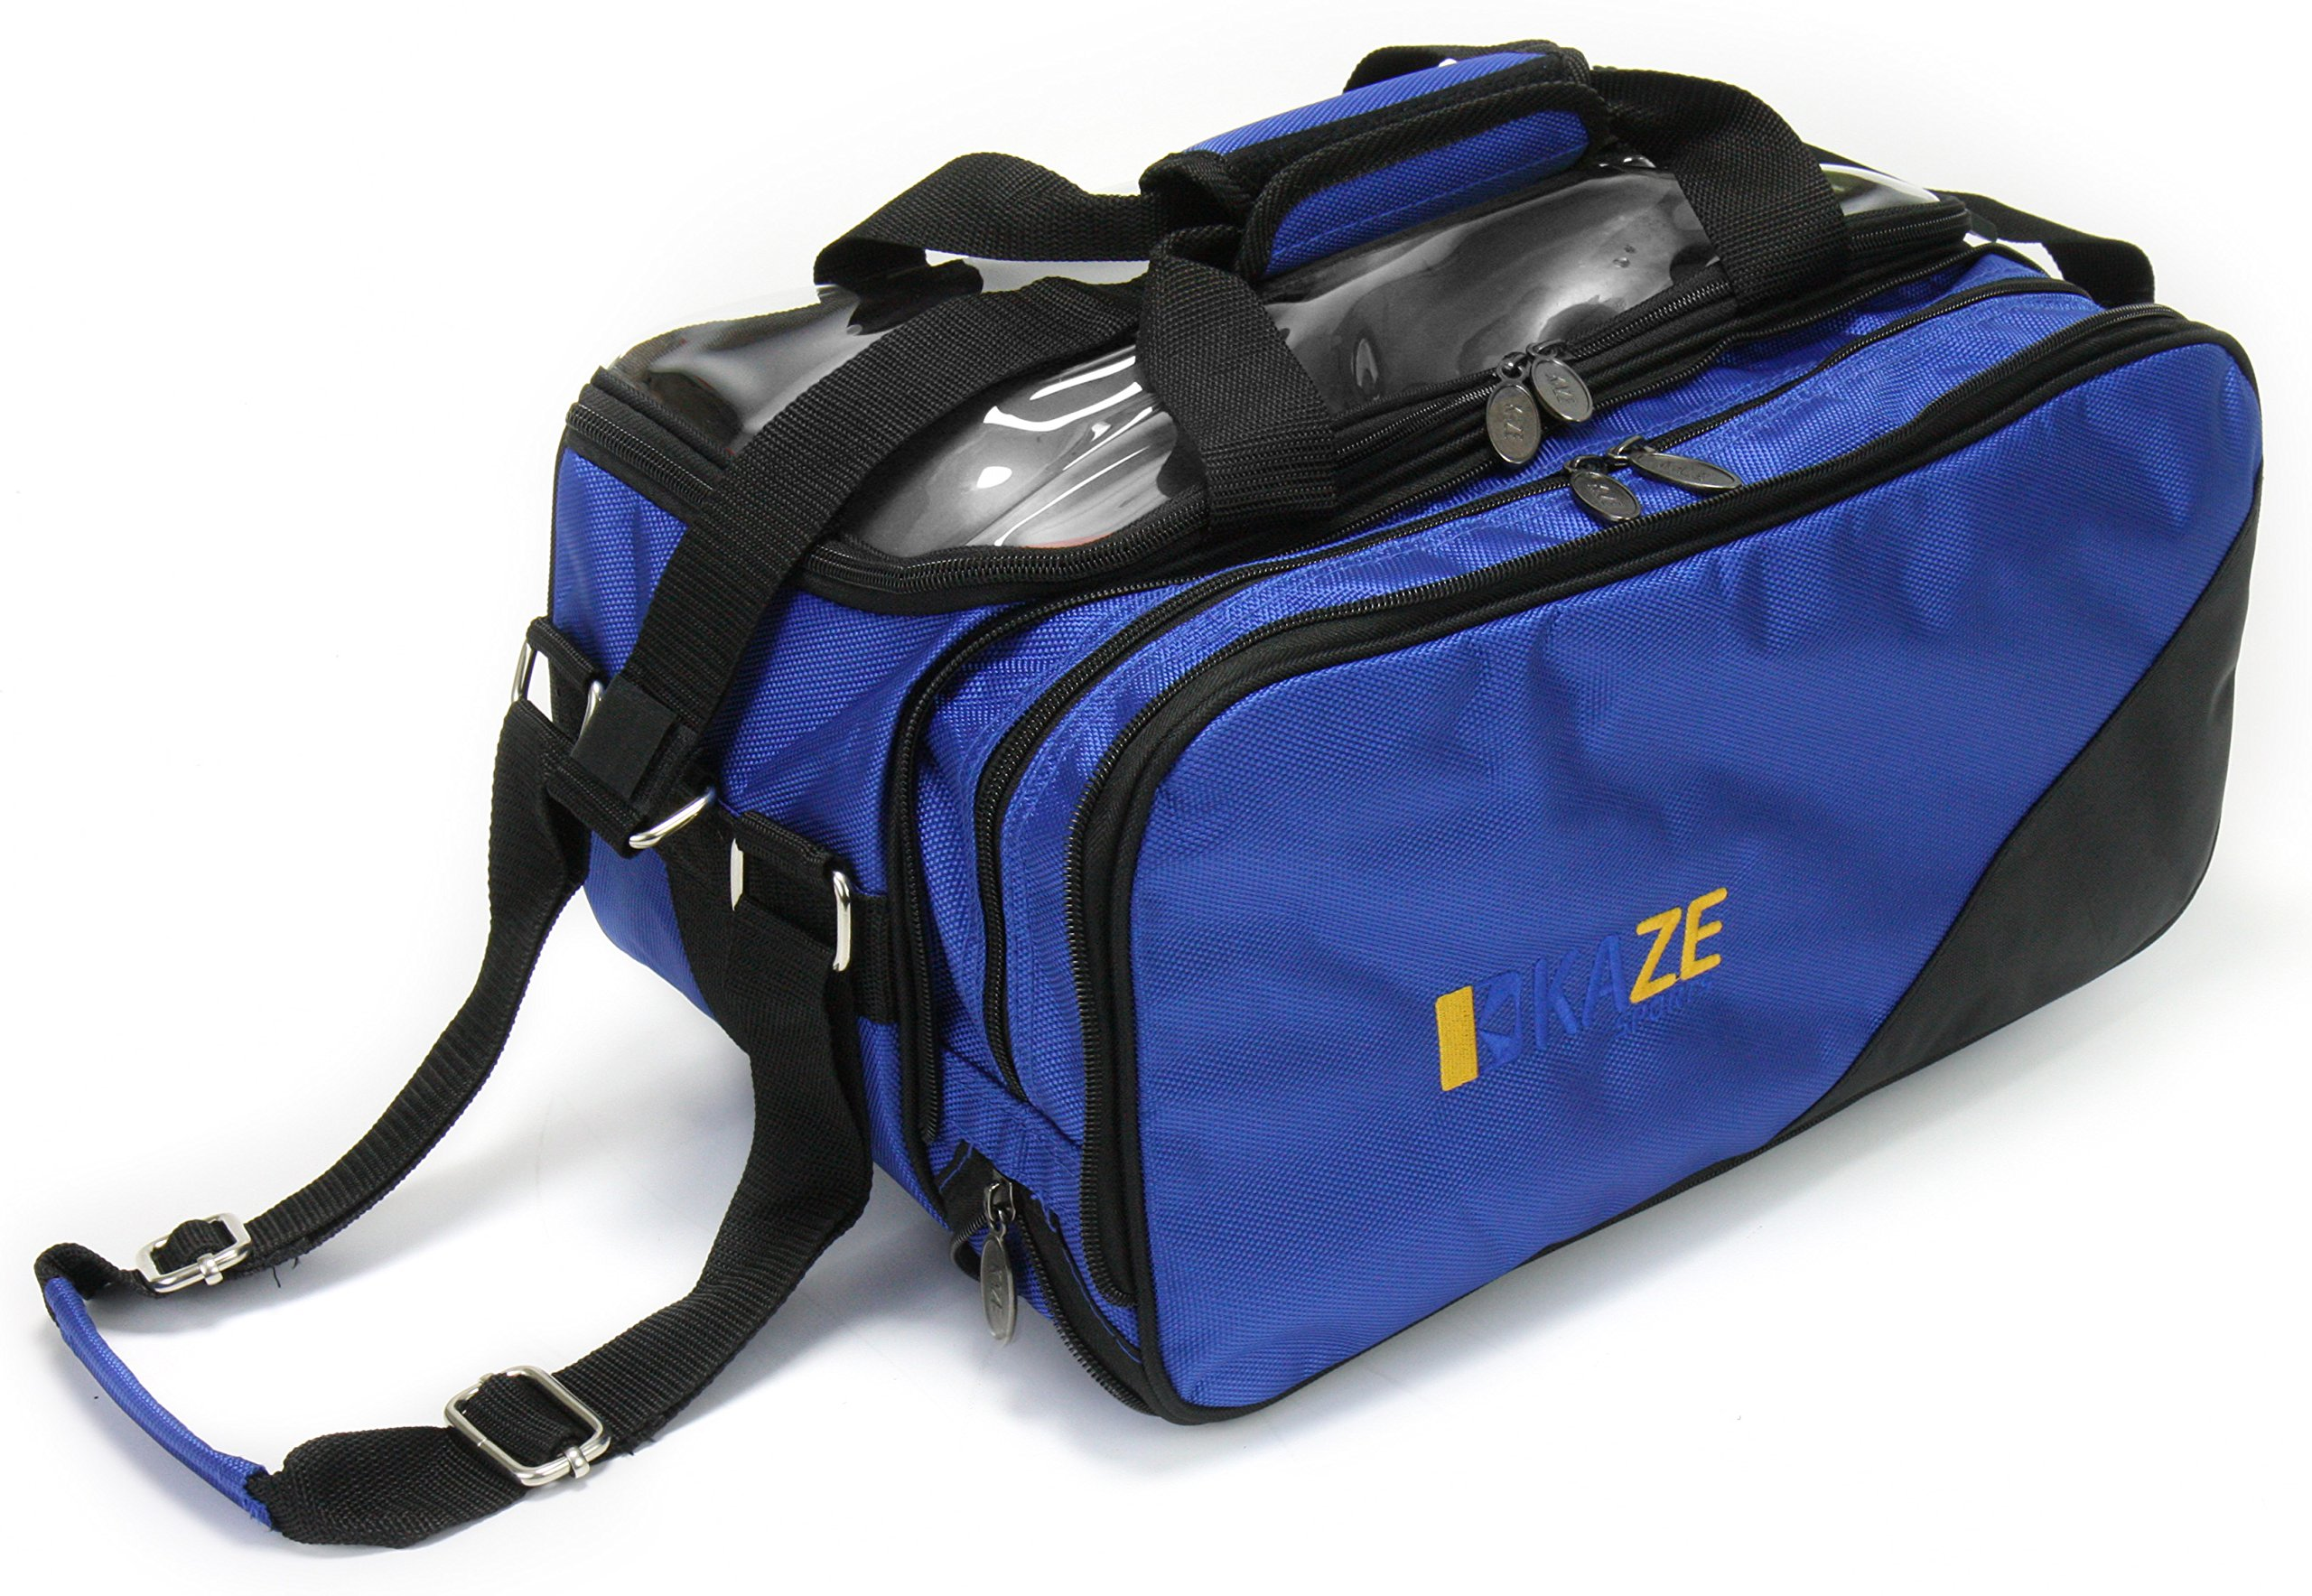 KAZE SPORTS 2 Ball Compact Bowling Roller with Expandable Shoe Storage (Blue) by KAZE SPORTS